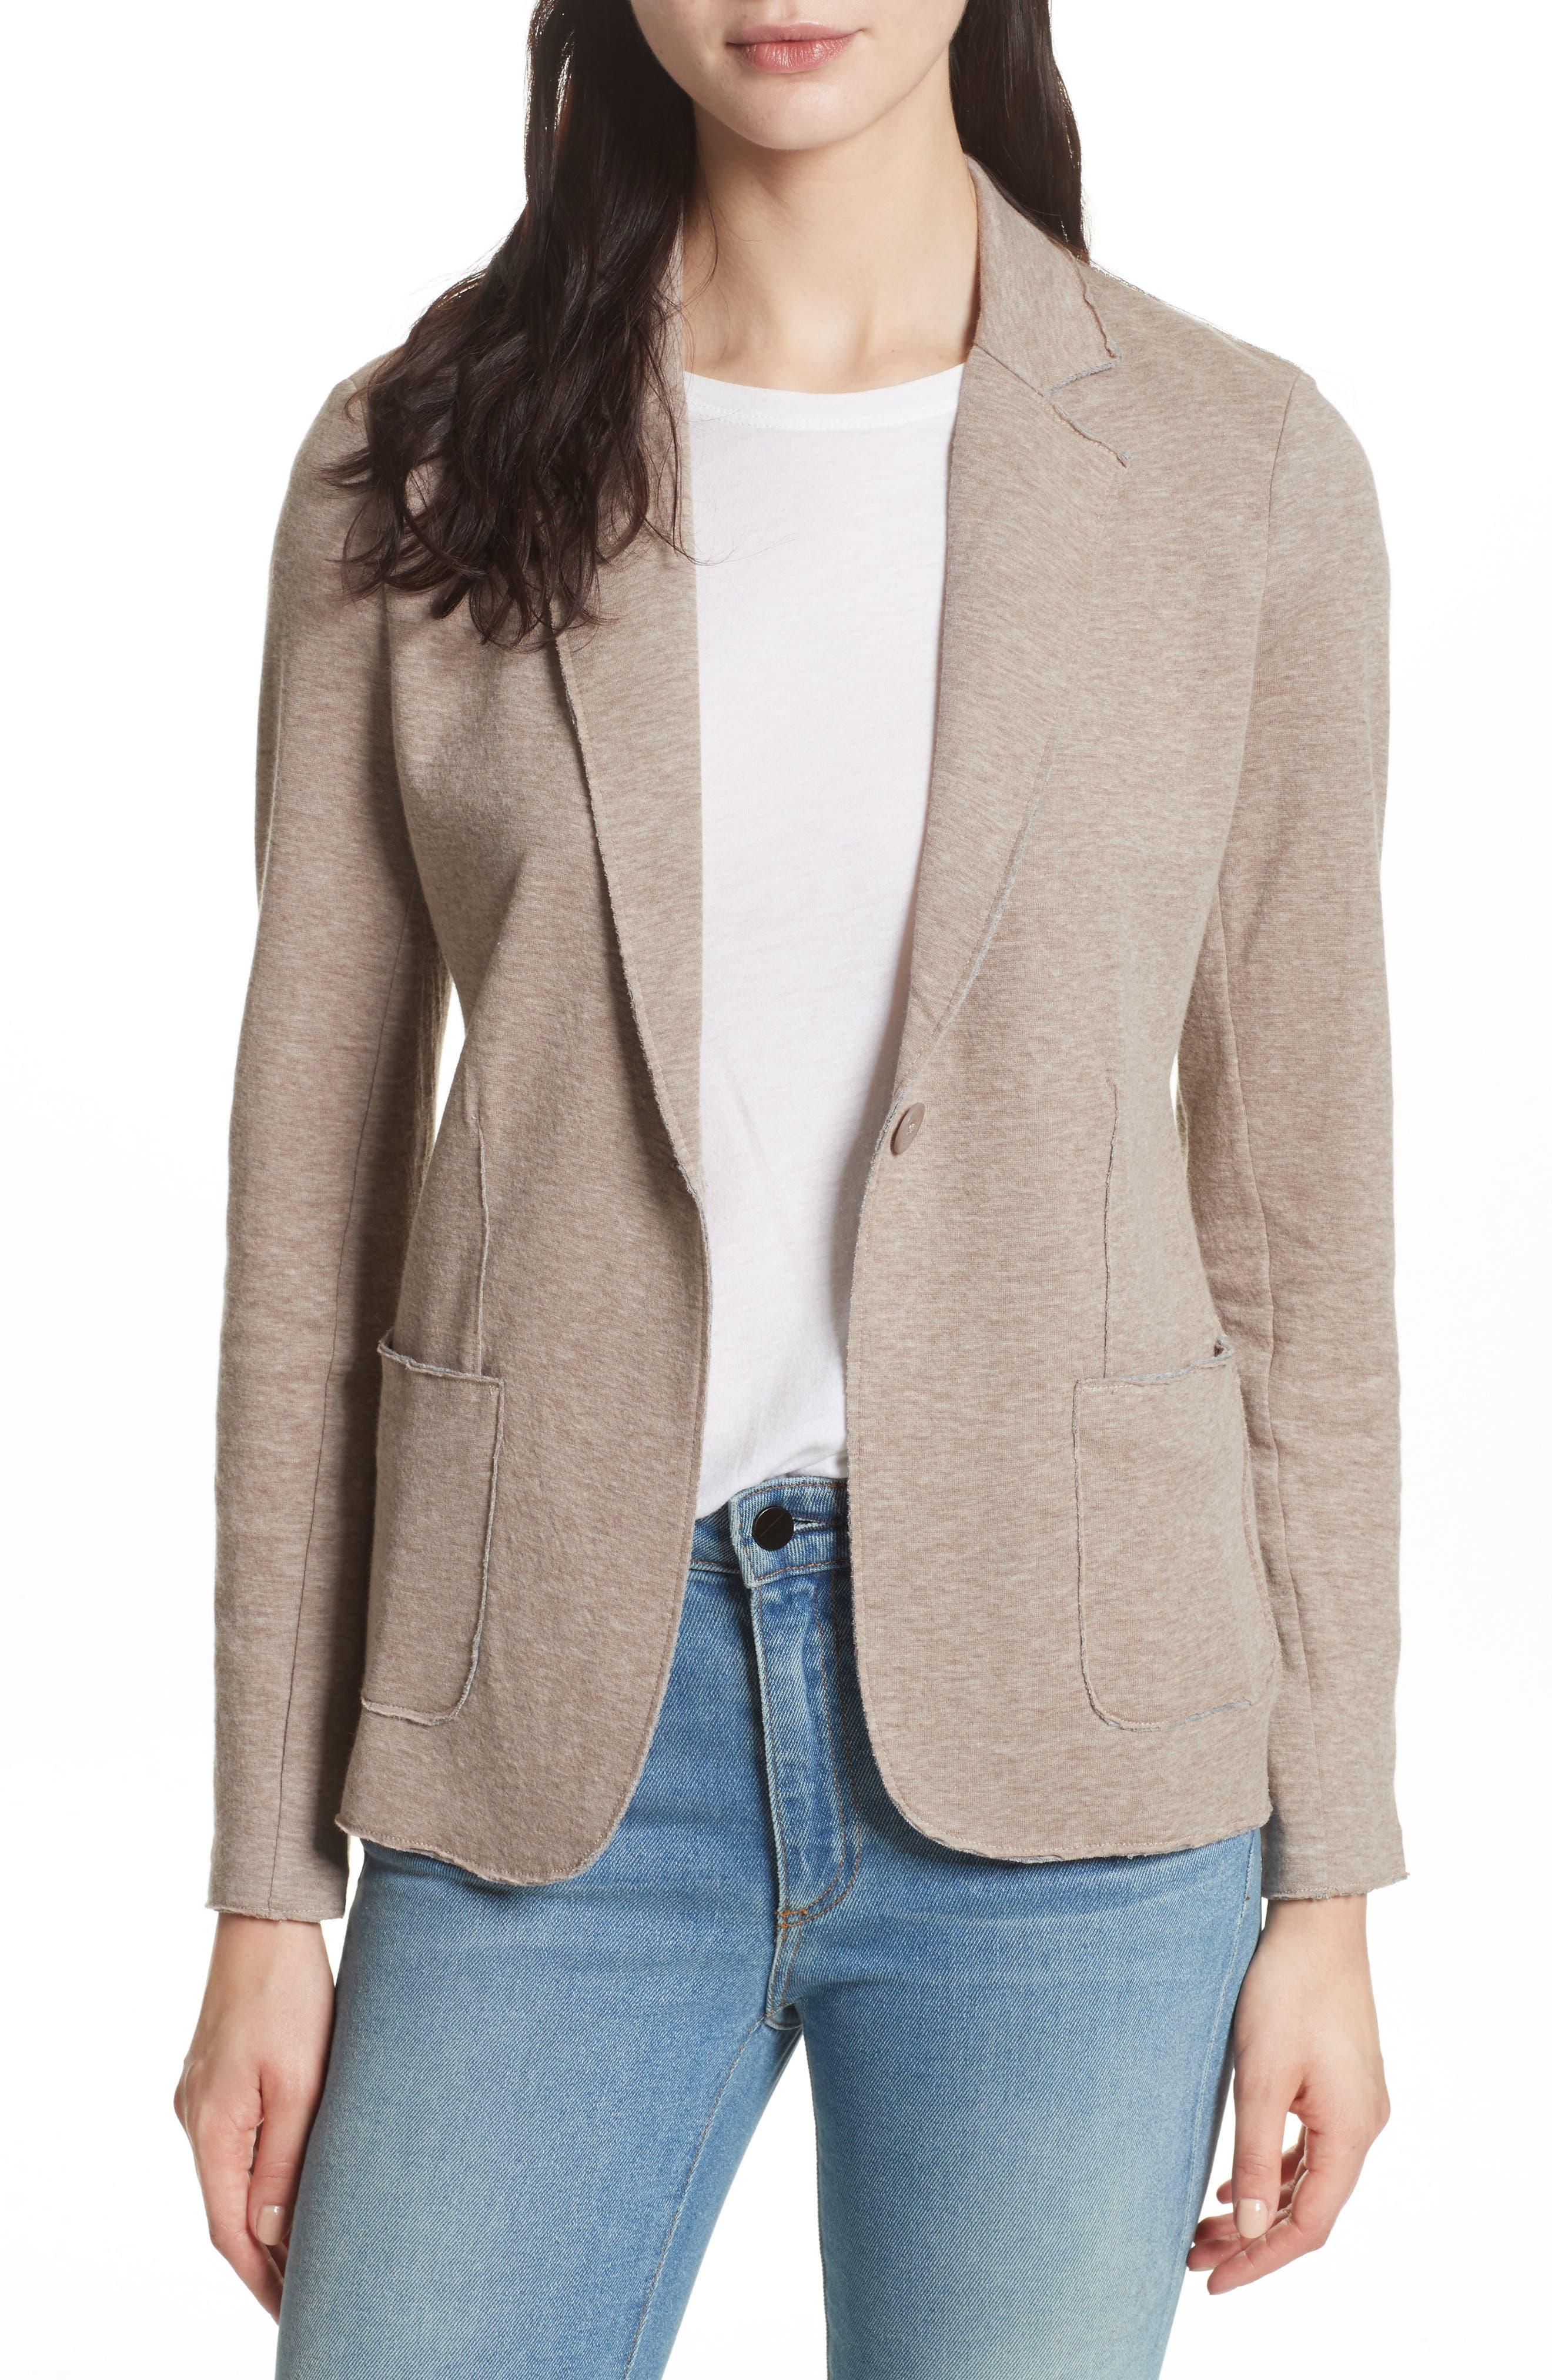 Majestic Filatures One-Button Cotton & Cashmere Blazer